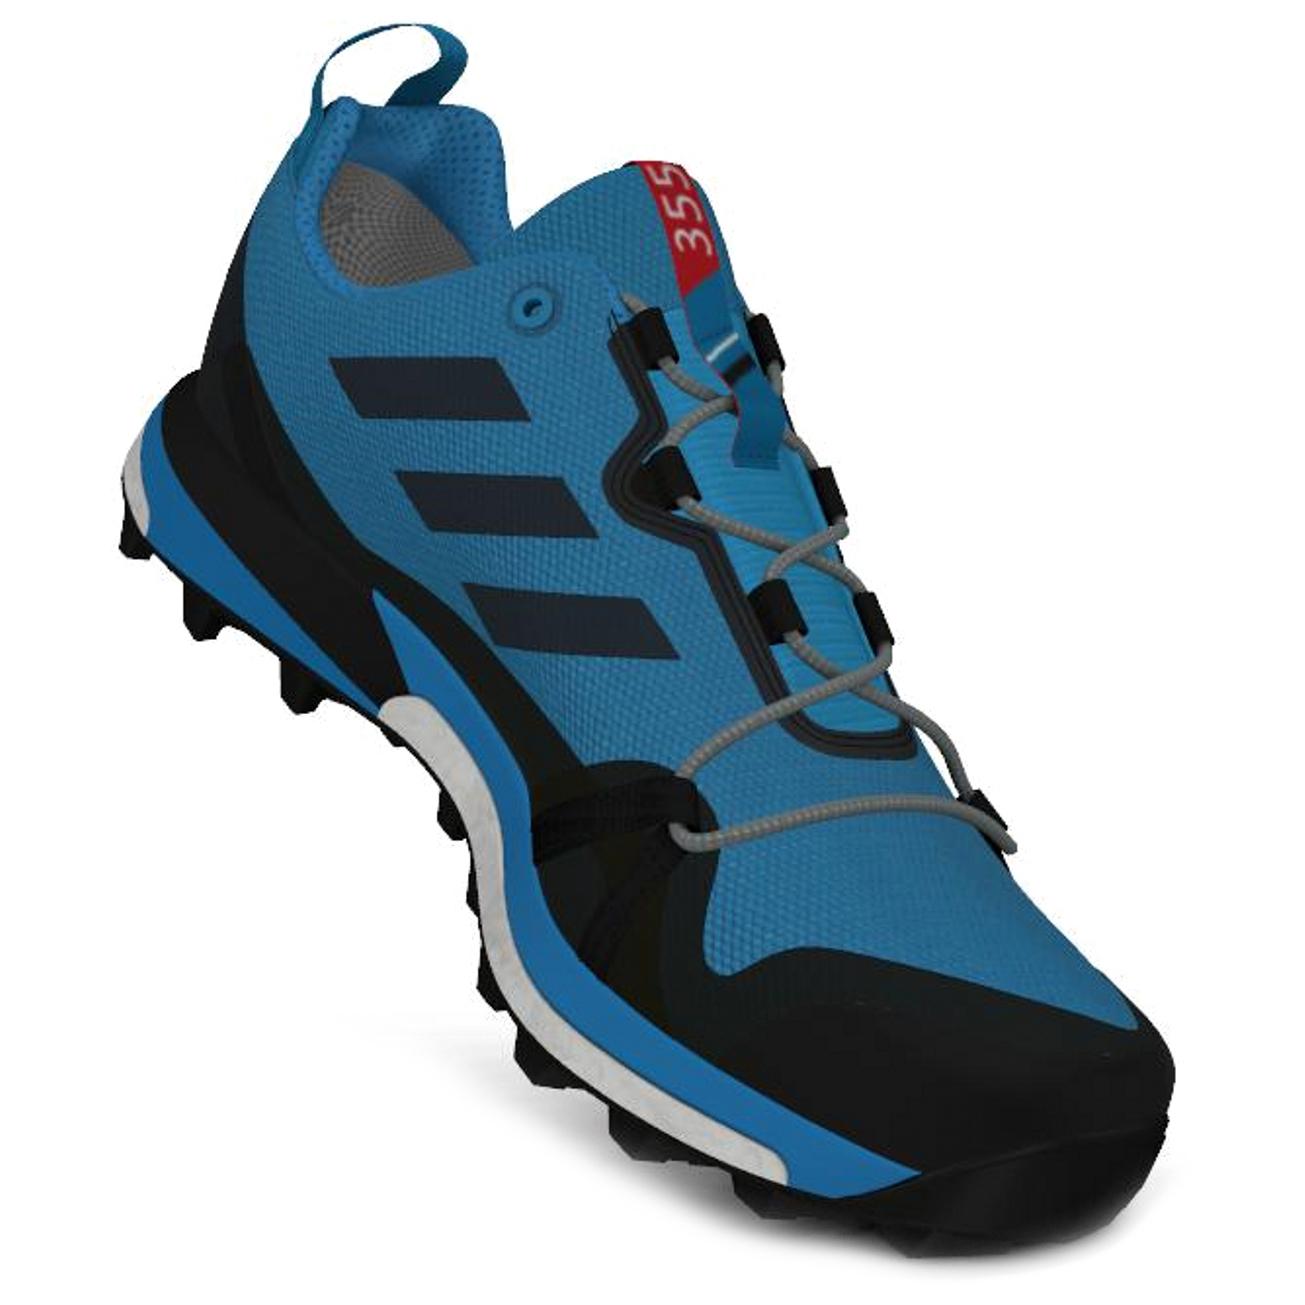 online store e4e1c 82d60 adidas - Terrex Skychaser LT GTX - Multisportschuhe ...